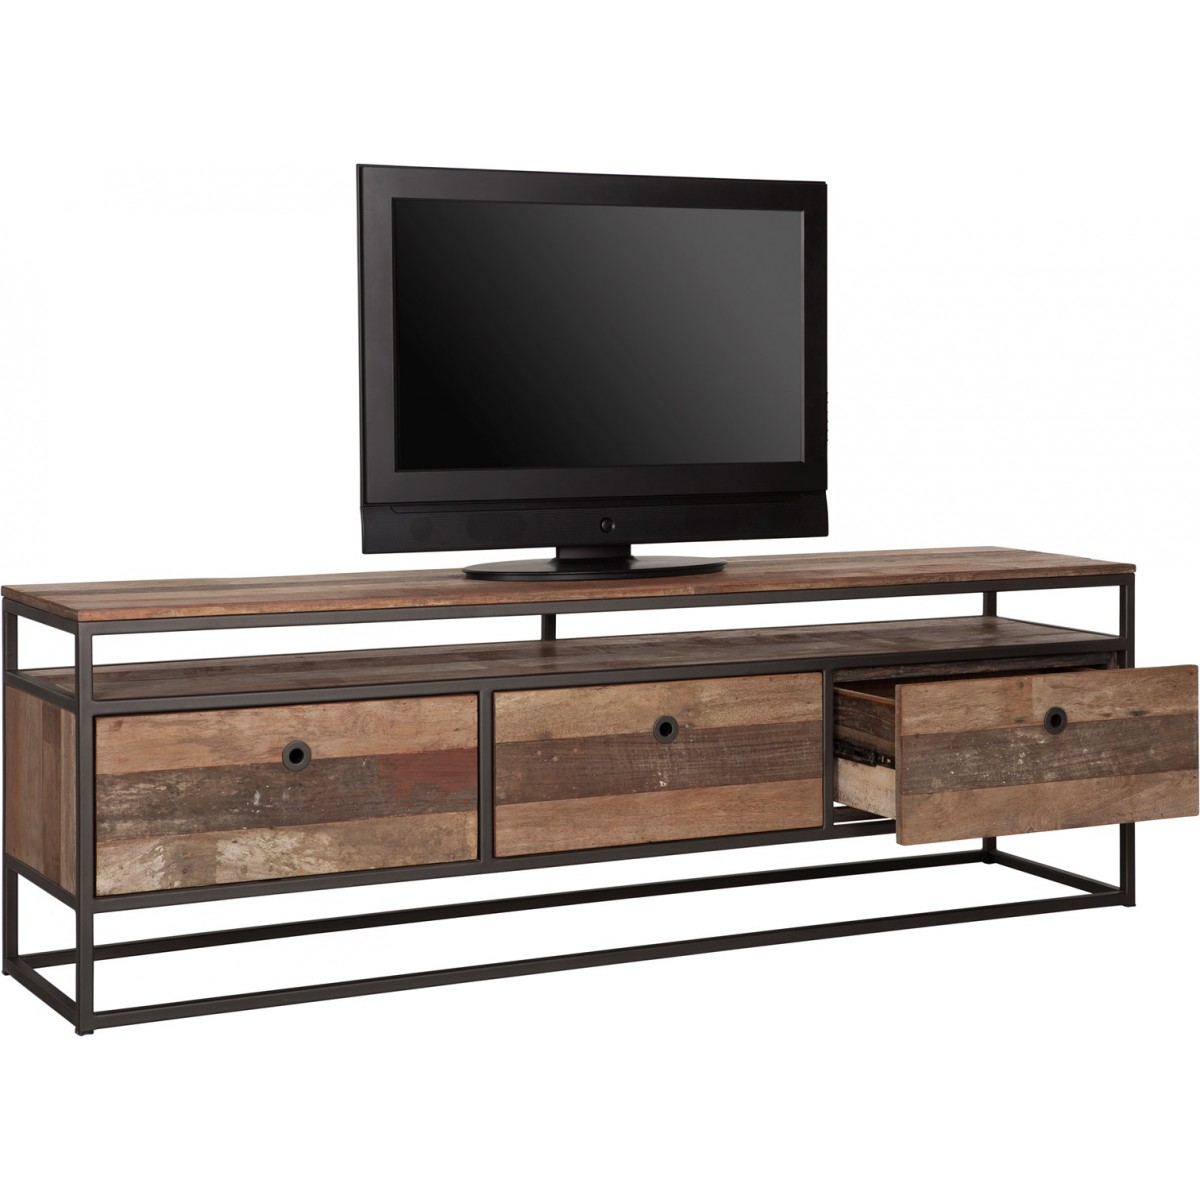 tuareg-dressoir-tv-meubel-no2-3-laden-55x175x40-cm-1-miltonhouse